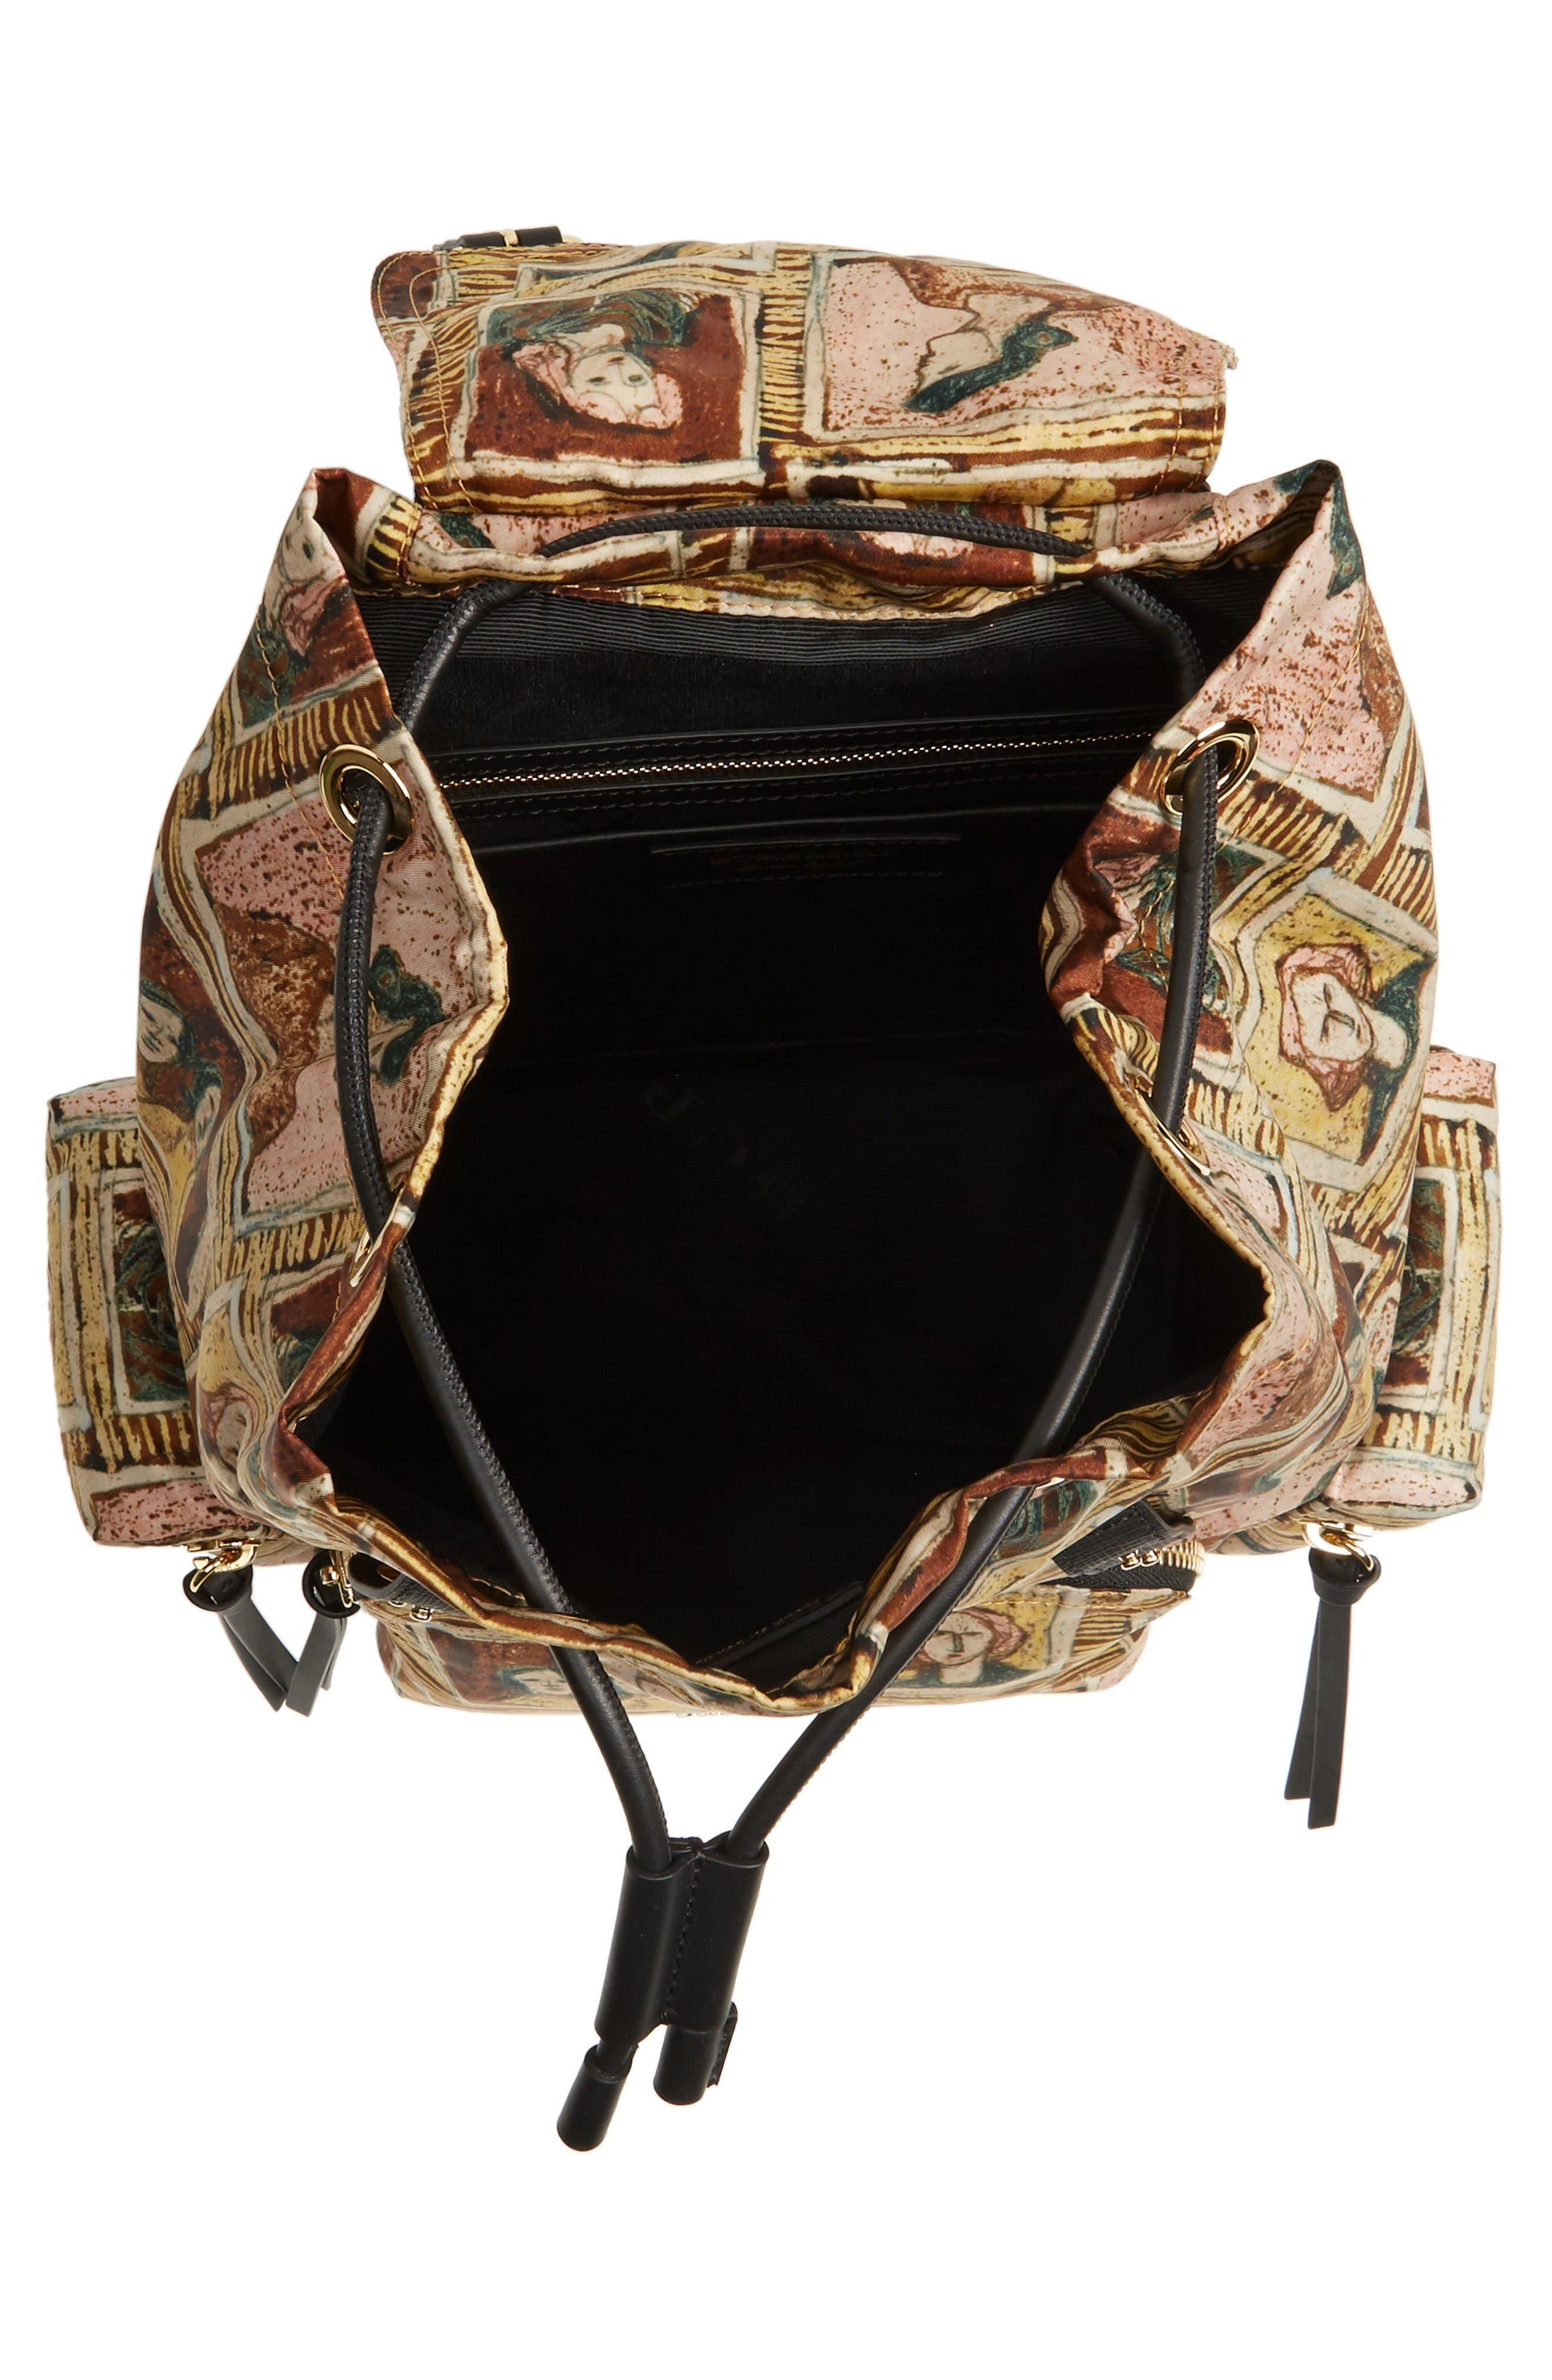 Medium Henrey Backpack,                             Alternate thumbnail 4, color,                             Umber Brown Multi